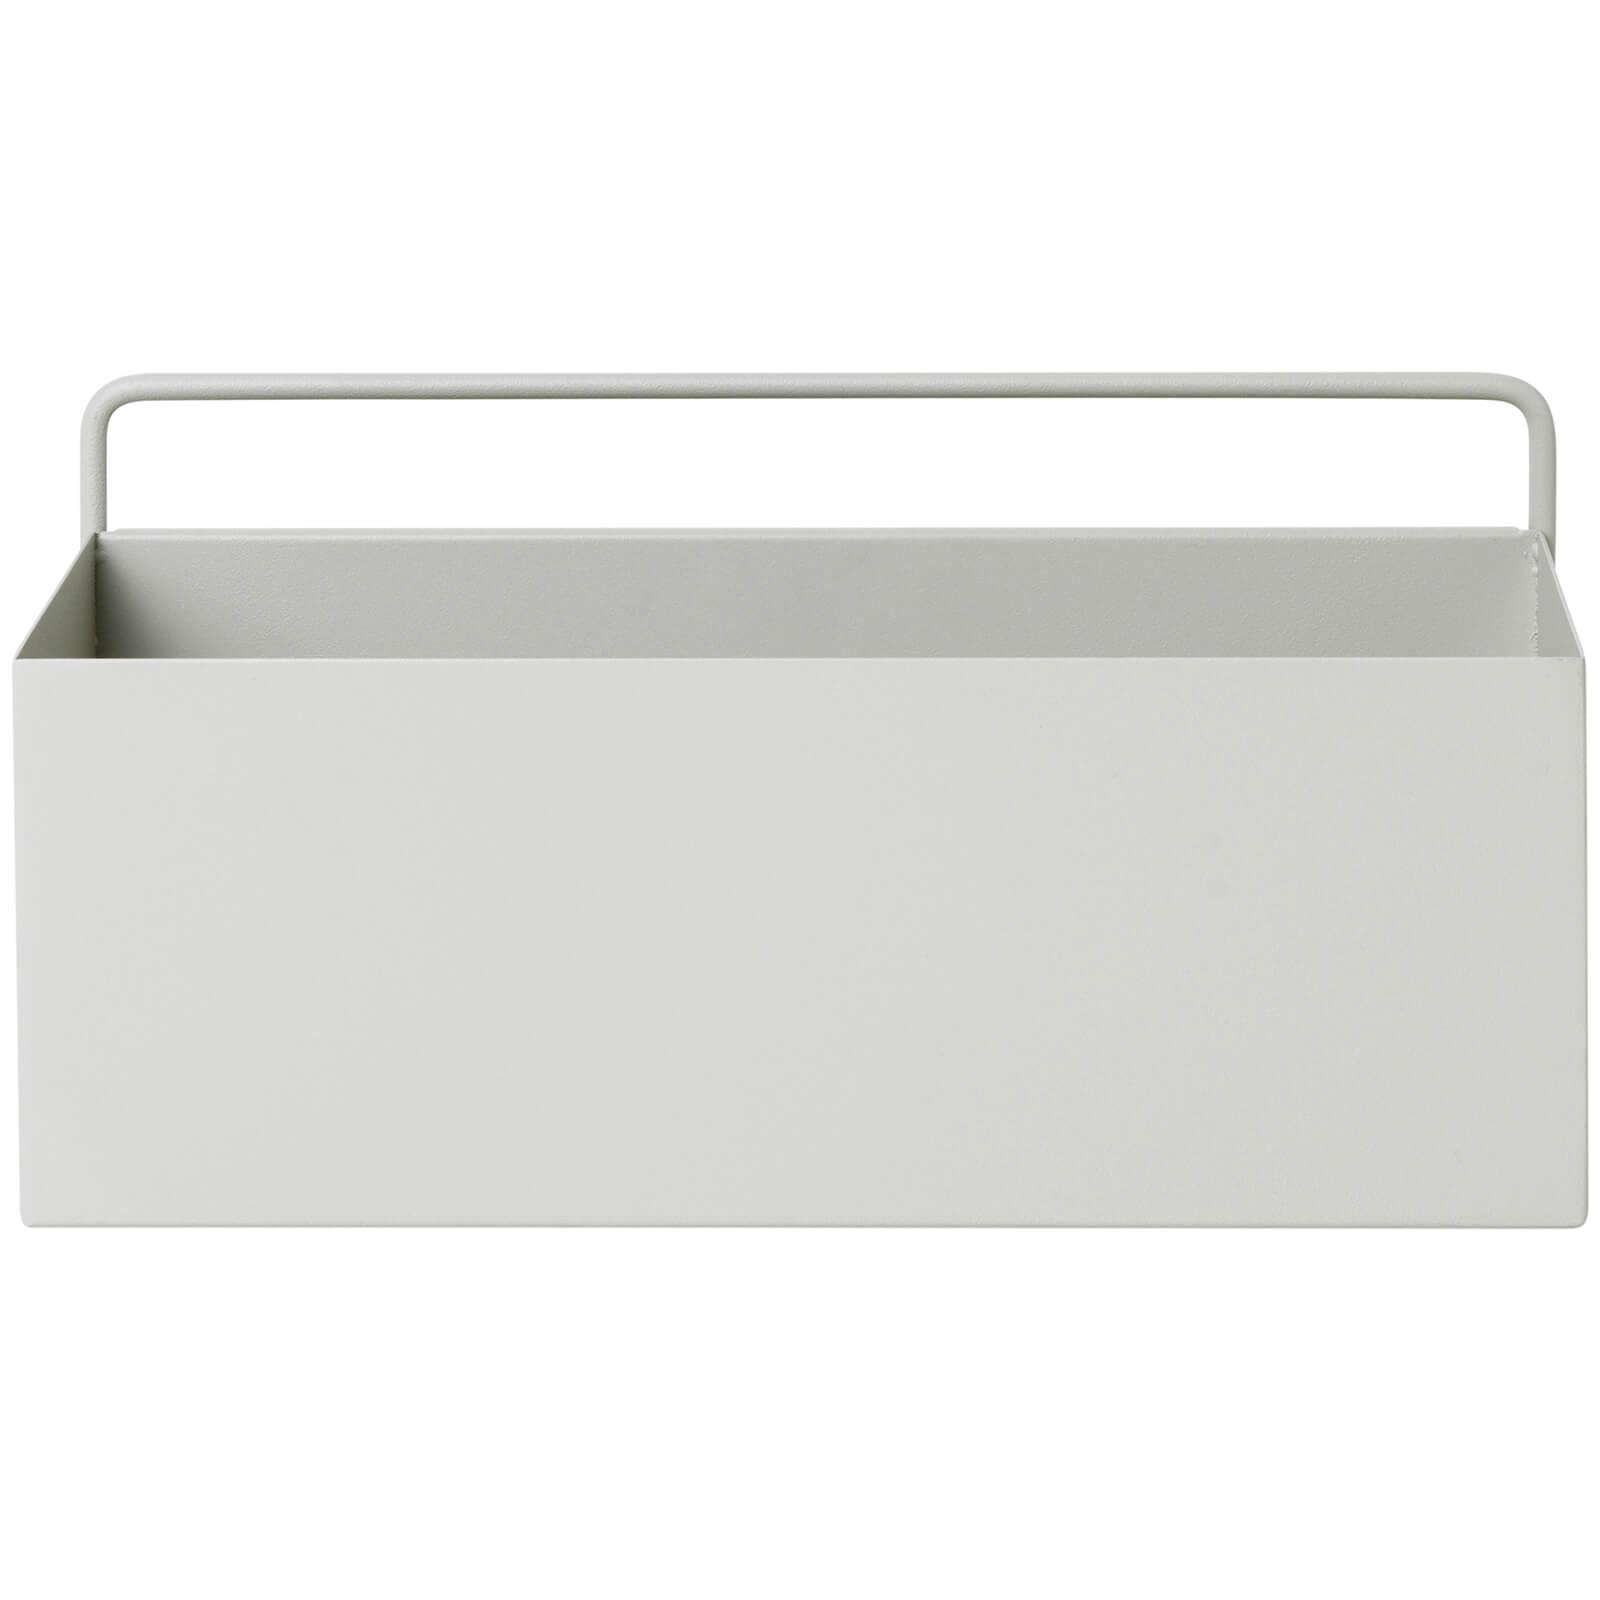 Ferm Living Wall Box - Rectangle - Light Grey